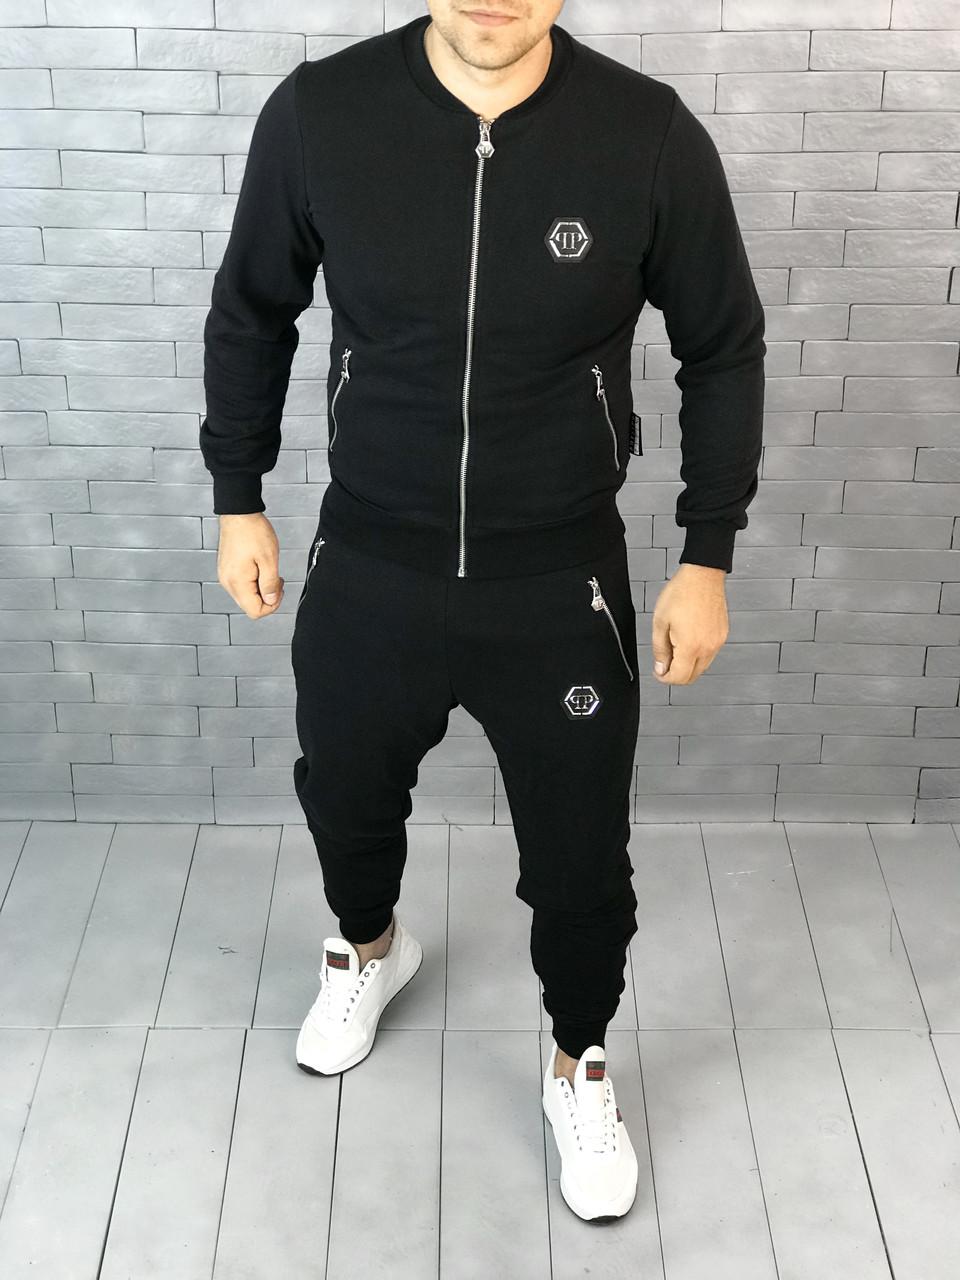 fb1f05b1 Спортивный костюм Philipp Plein D2274 черный бомбер теплый - купить ...